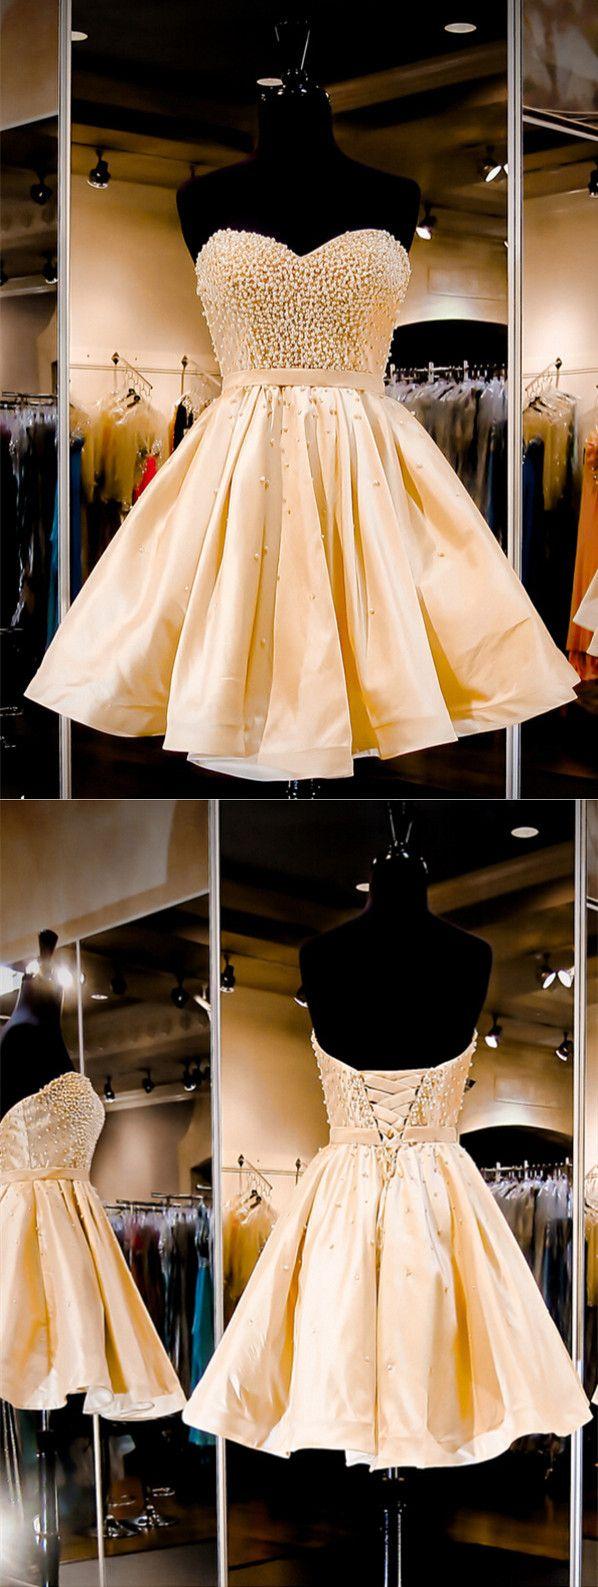 2016 homecoming dresses,homecoming dresses,short prom dresses,cheap champagne homecoming dresses,sweetheart homecoming dresses,exquisite homecoming dresses,sparkle homecoming dresses